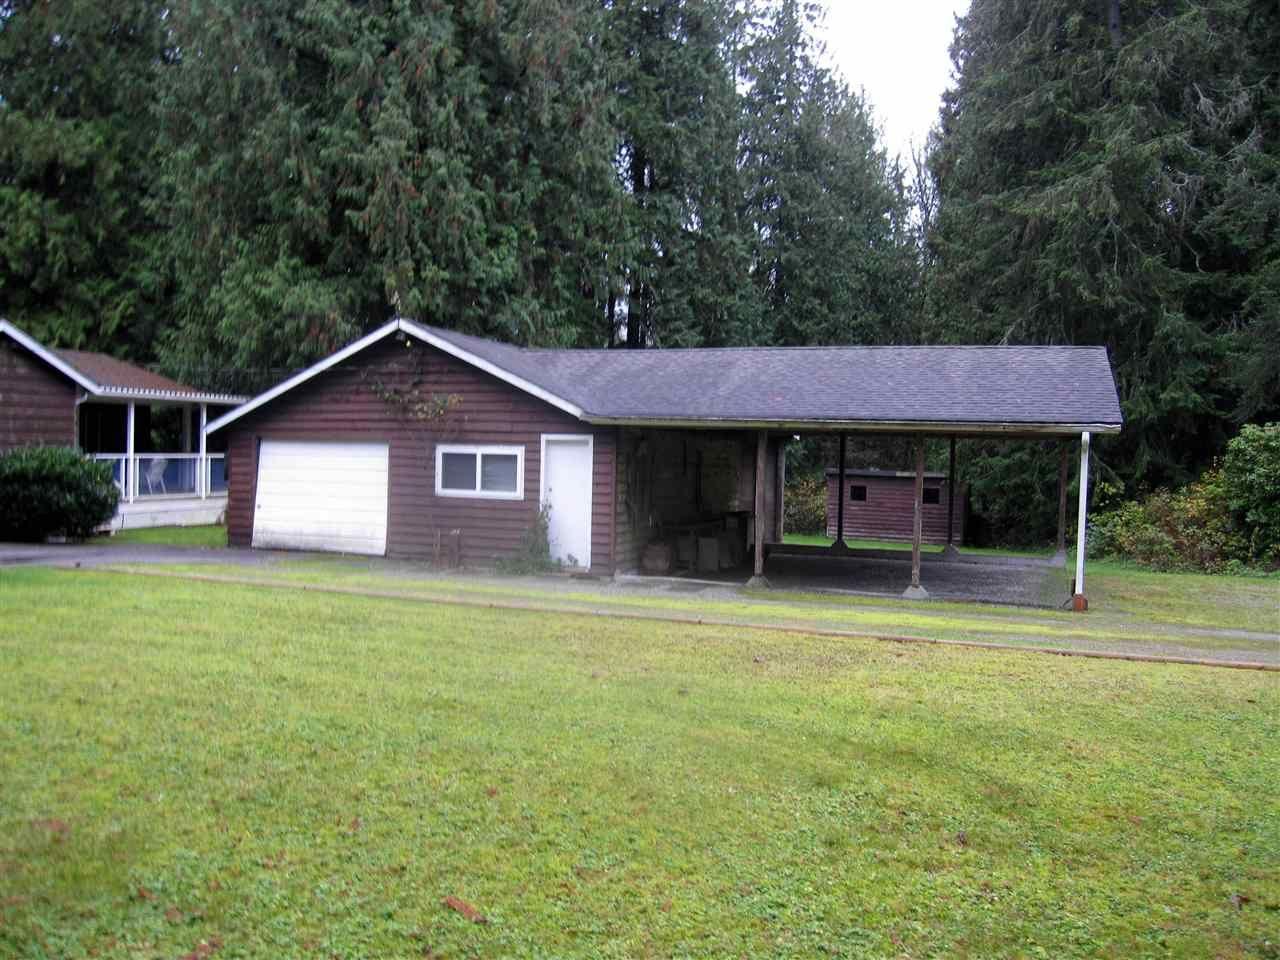 Photo 4: Photos: 11847 267 Street in Maple Ridge: Northeast House for sale : MLS®# R2322069